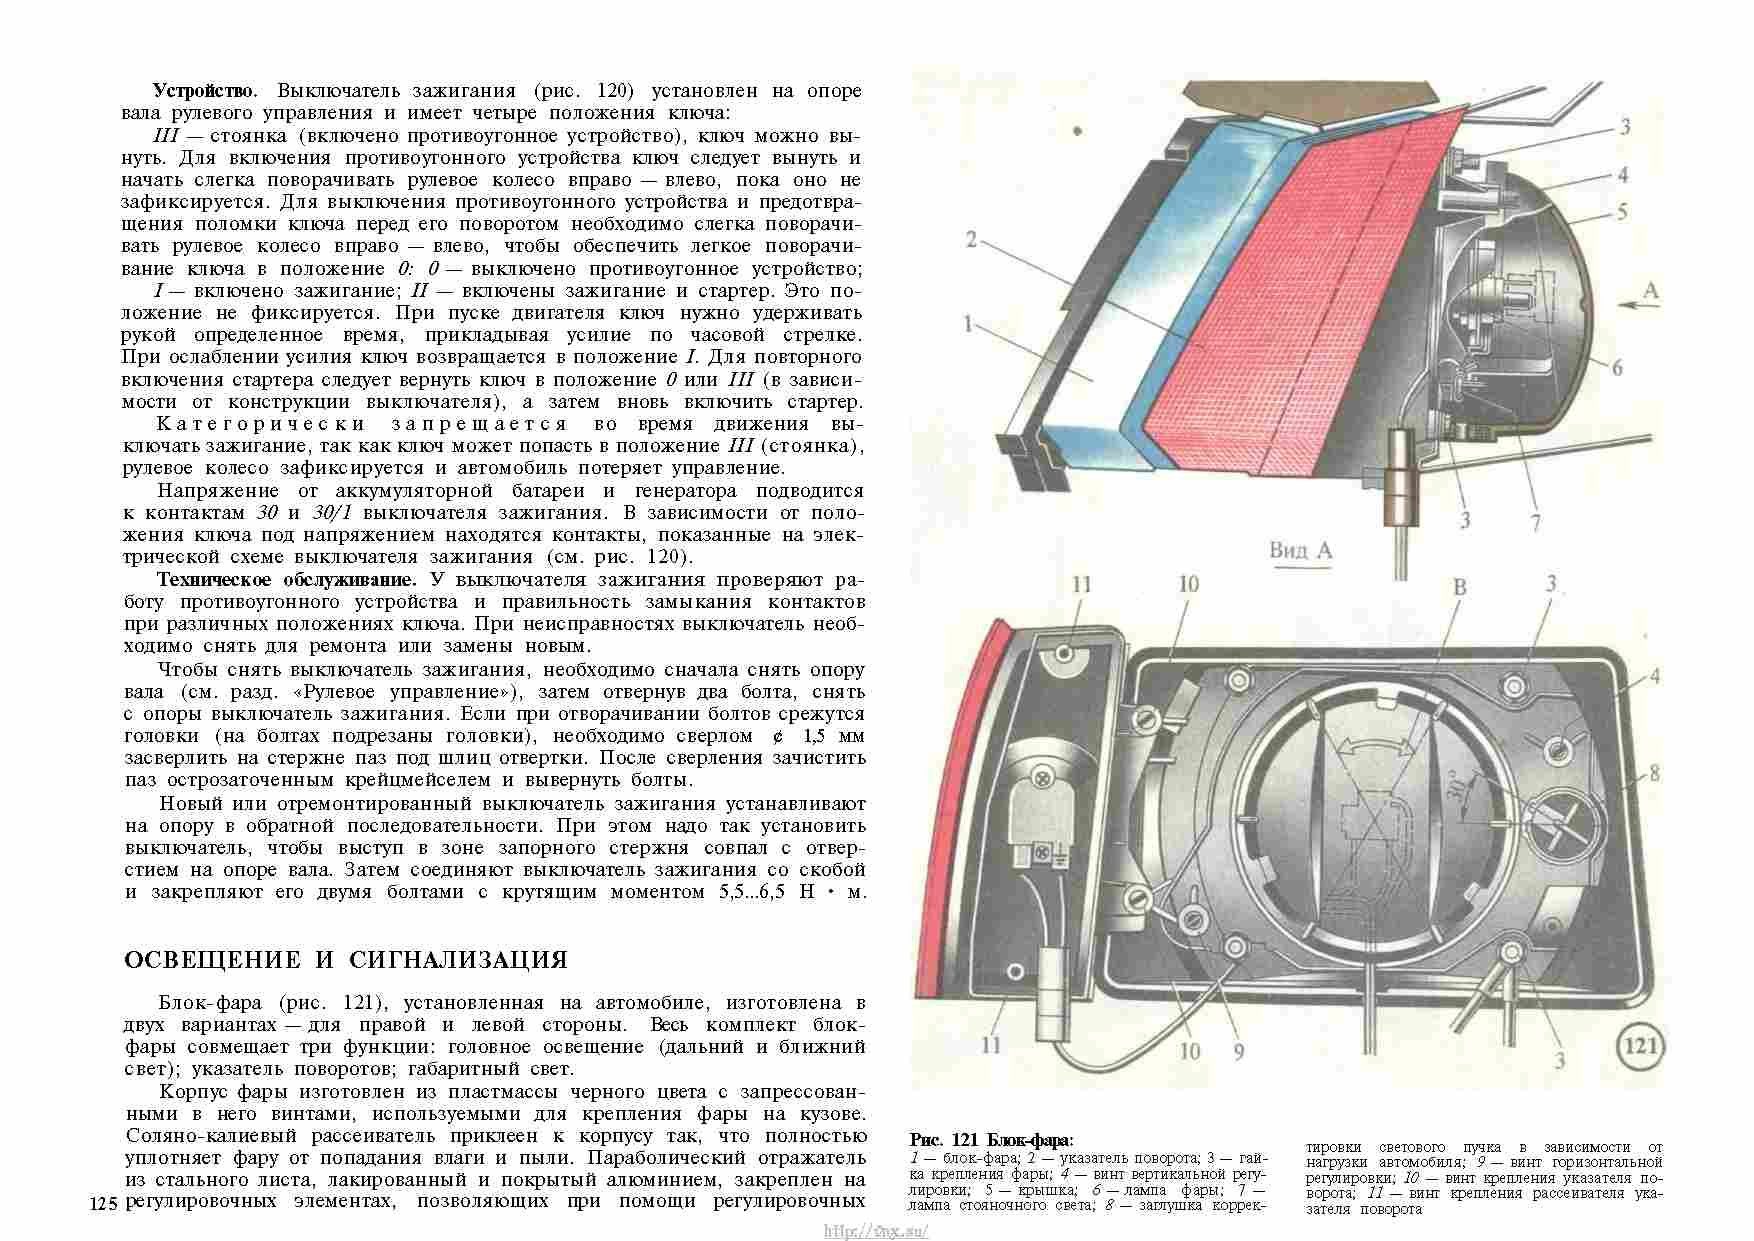 Регулировка угла опережения зажигания в двигателях мемз-245, мемз-2457, мемз-3011 заз-таврия / славута / дана